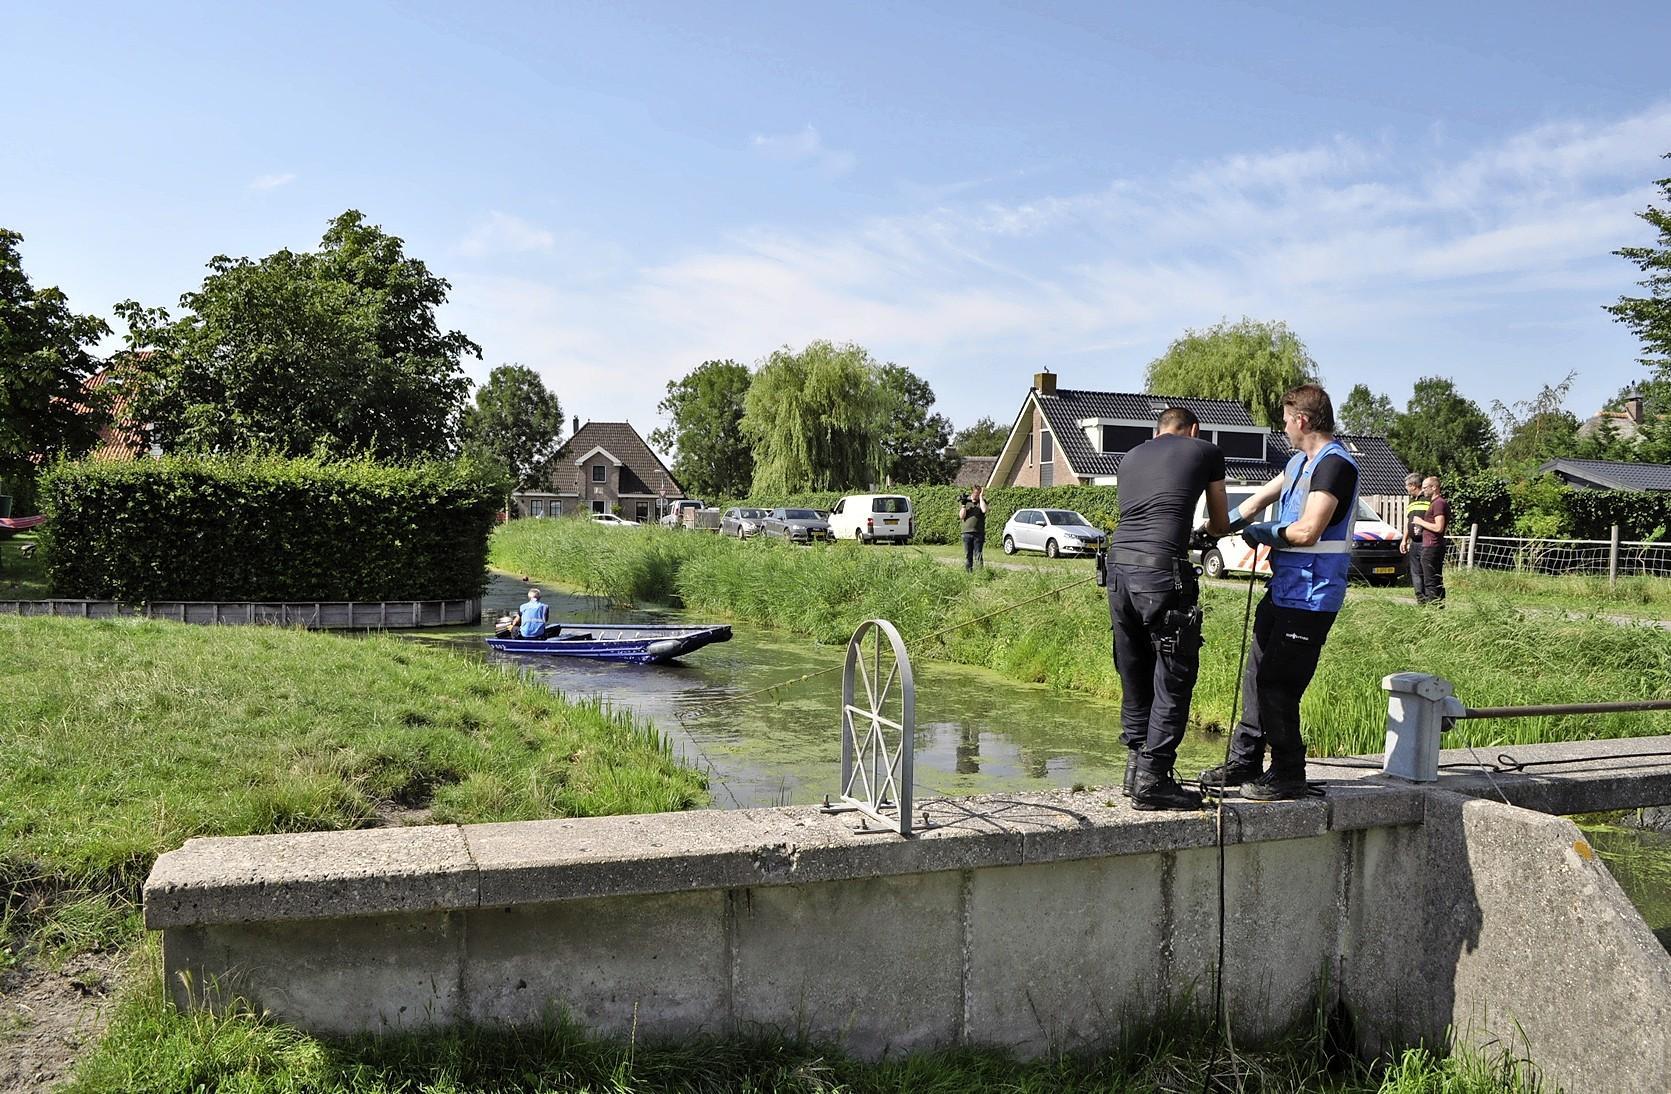 Verdachte uit Medemblik in zaak Dimitri langer vast